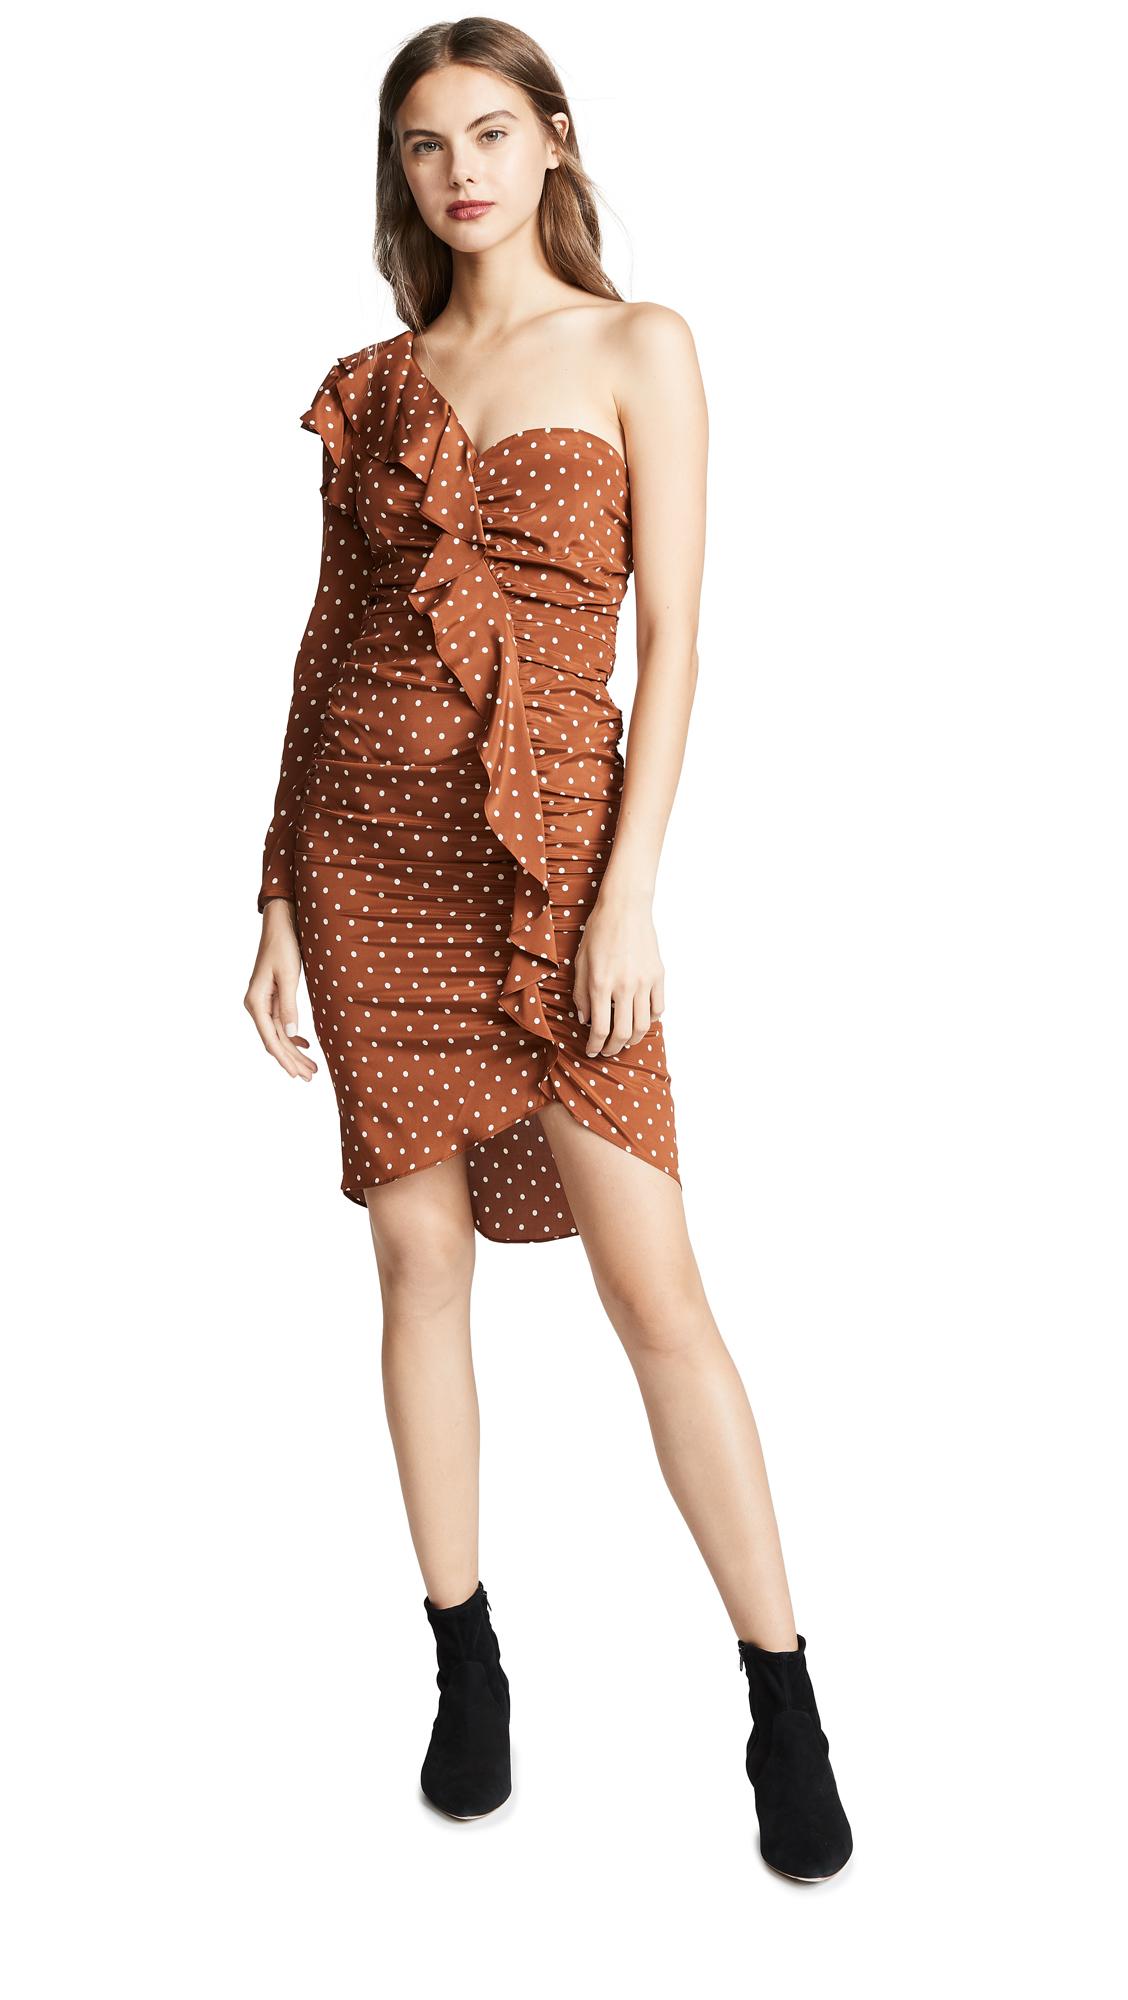 Veronica Beard Leona Dress - Bronze/Ivory